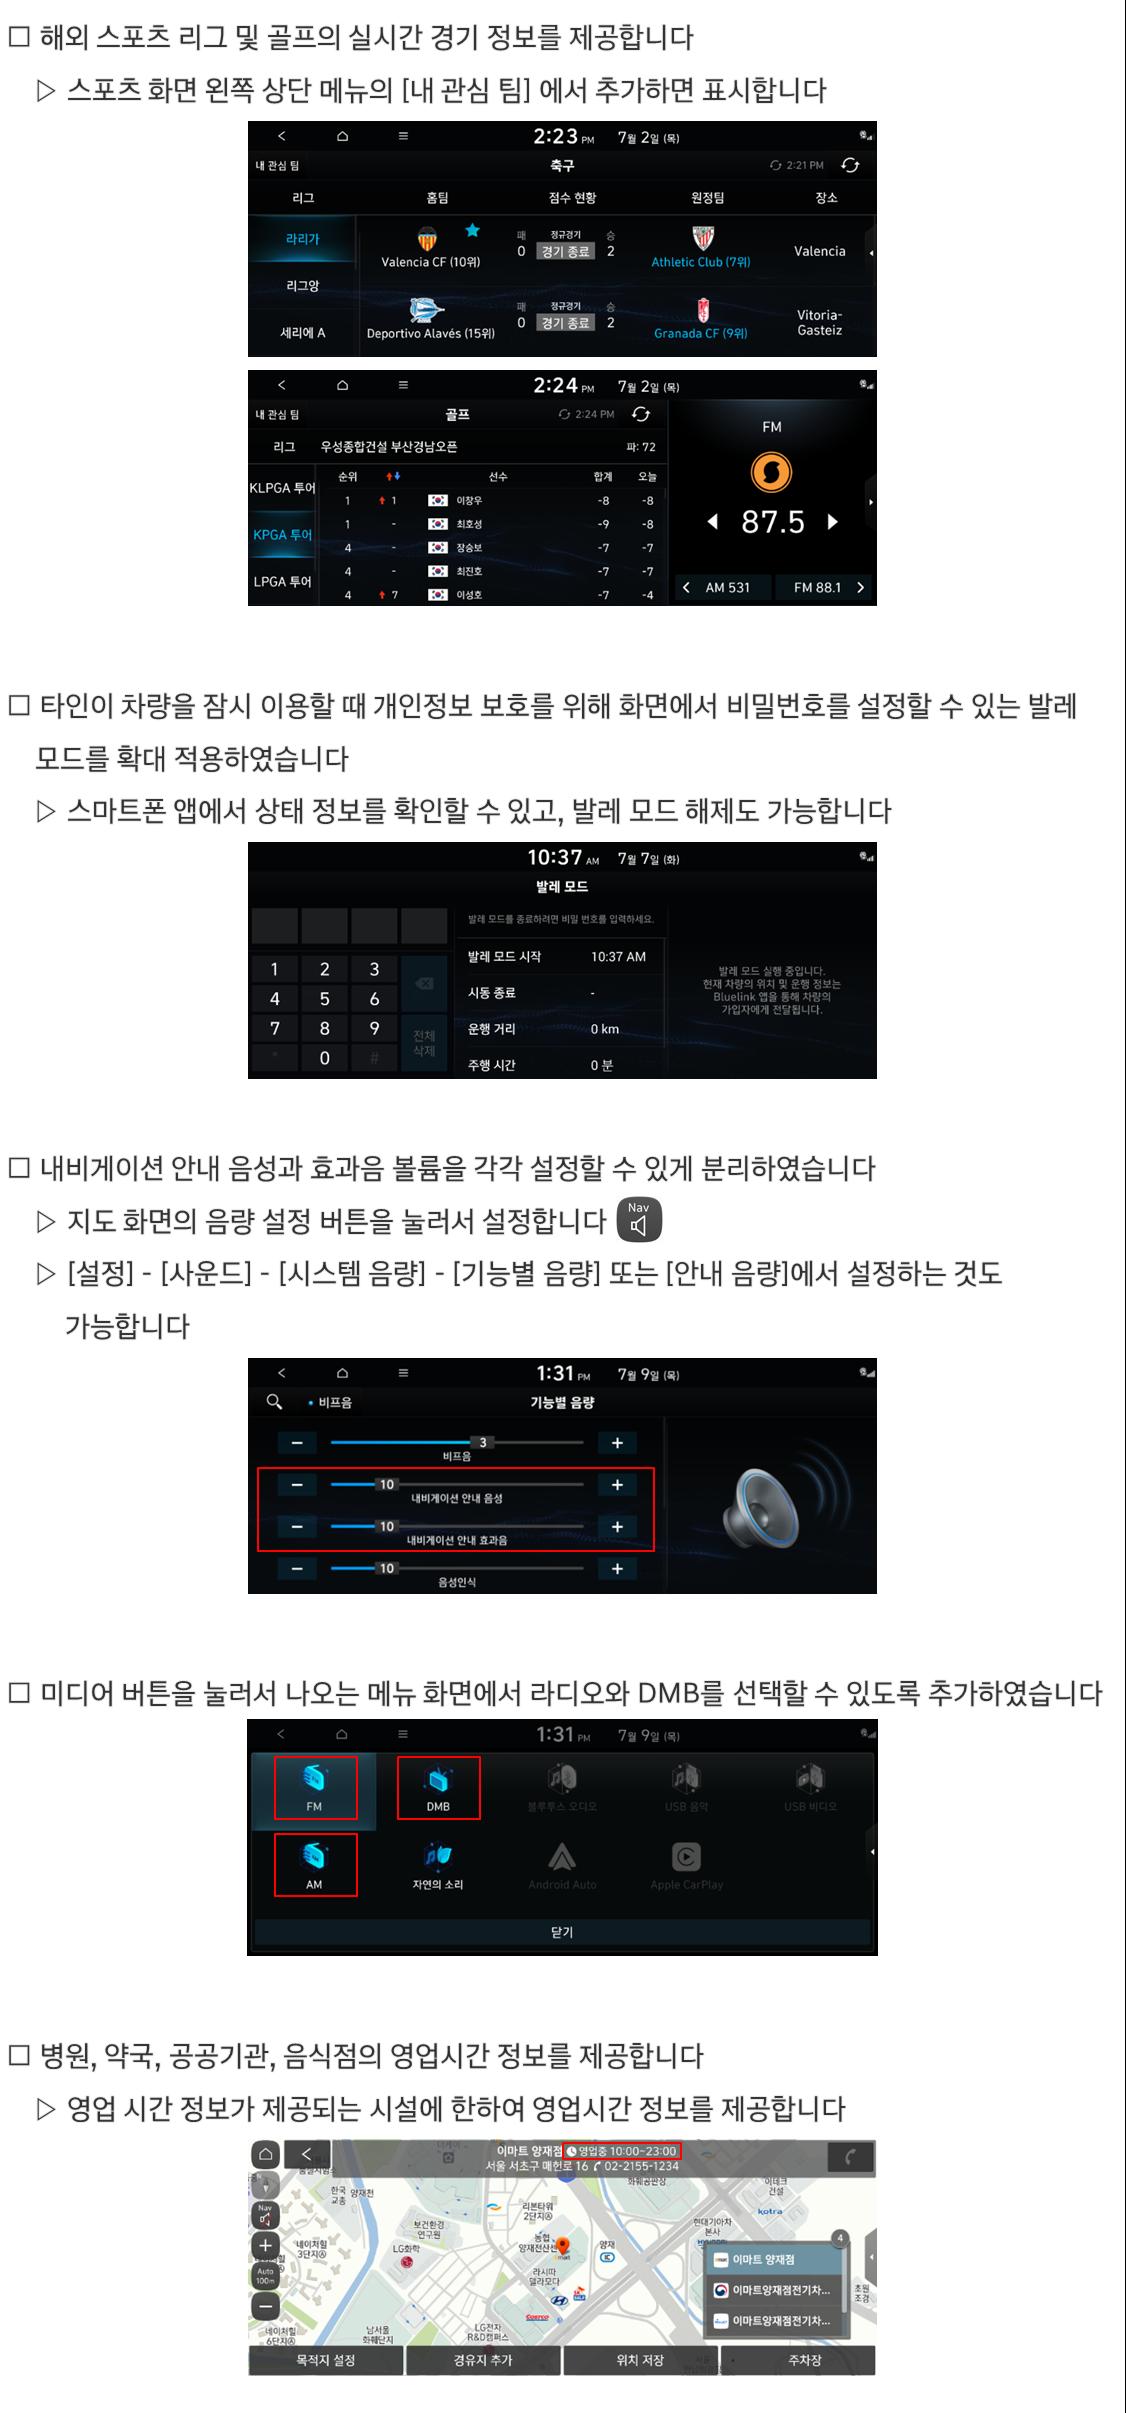 hd_04_updateinfo3.png